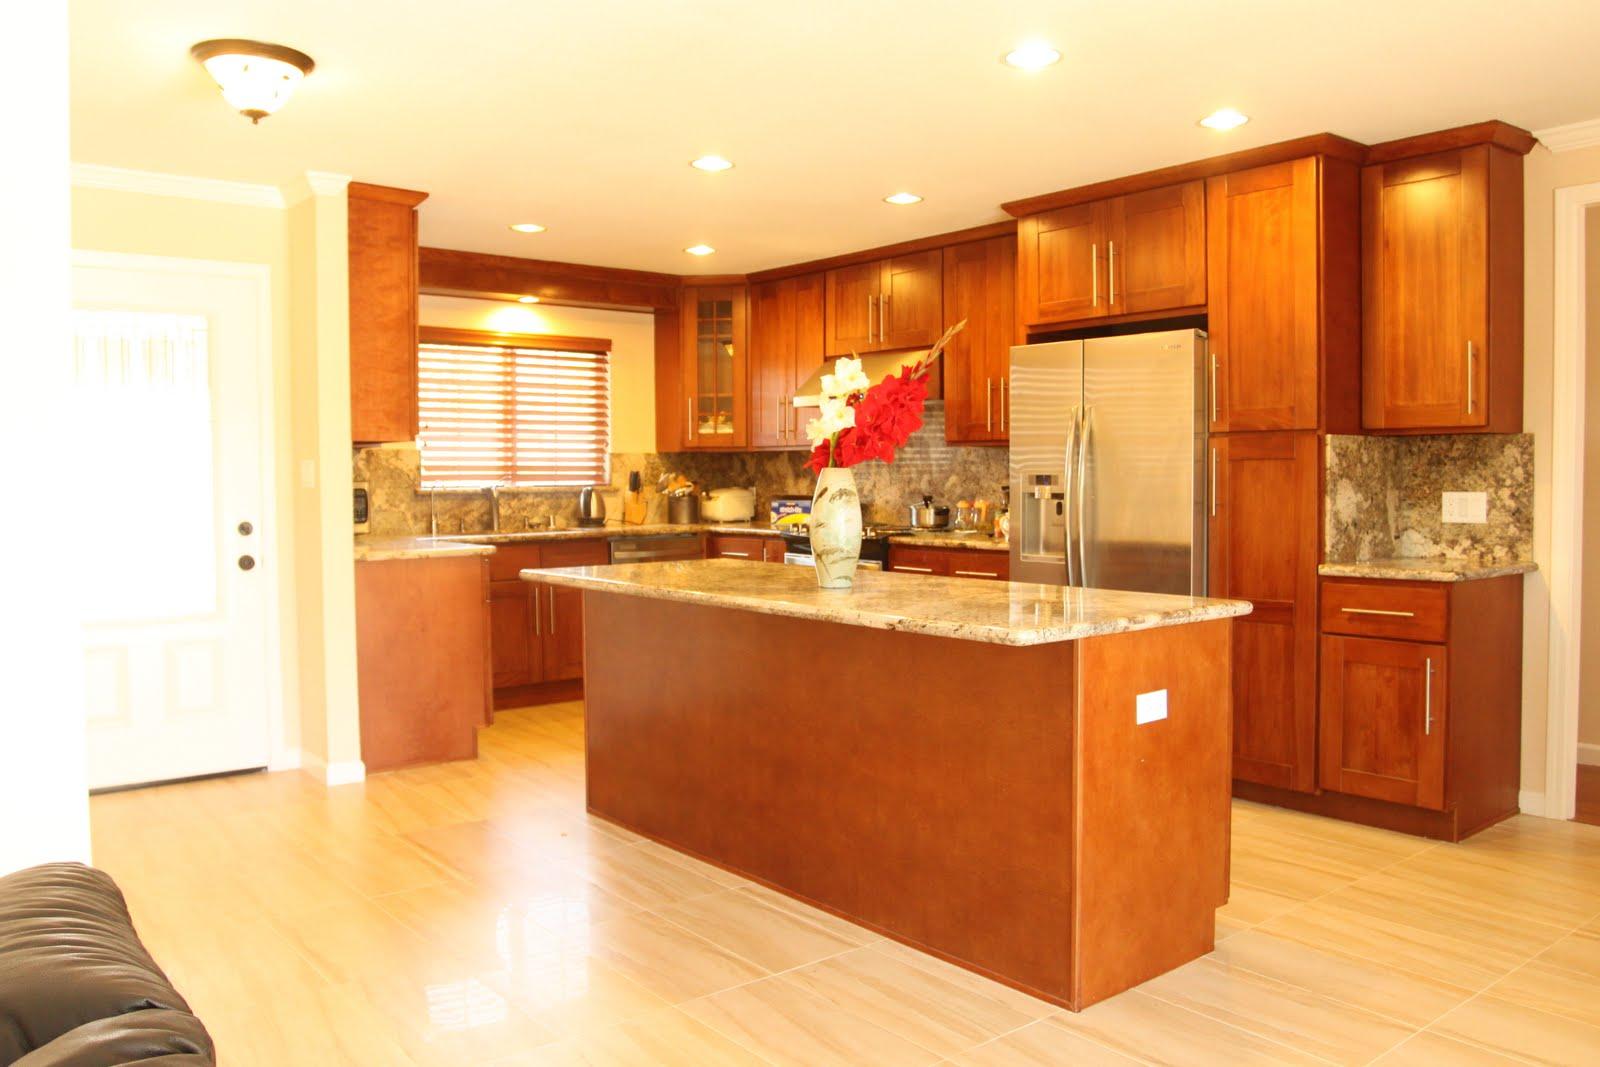 hong bo hardware supply cherry shaker kitchen cabinets juperano bruzio granite counter top. Black Bedroom Furniture Sets. Home Design Ideas